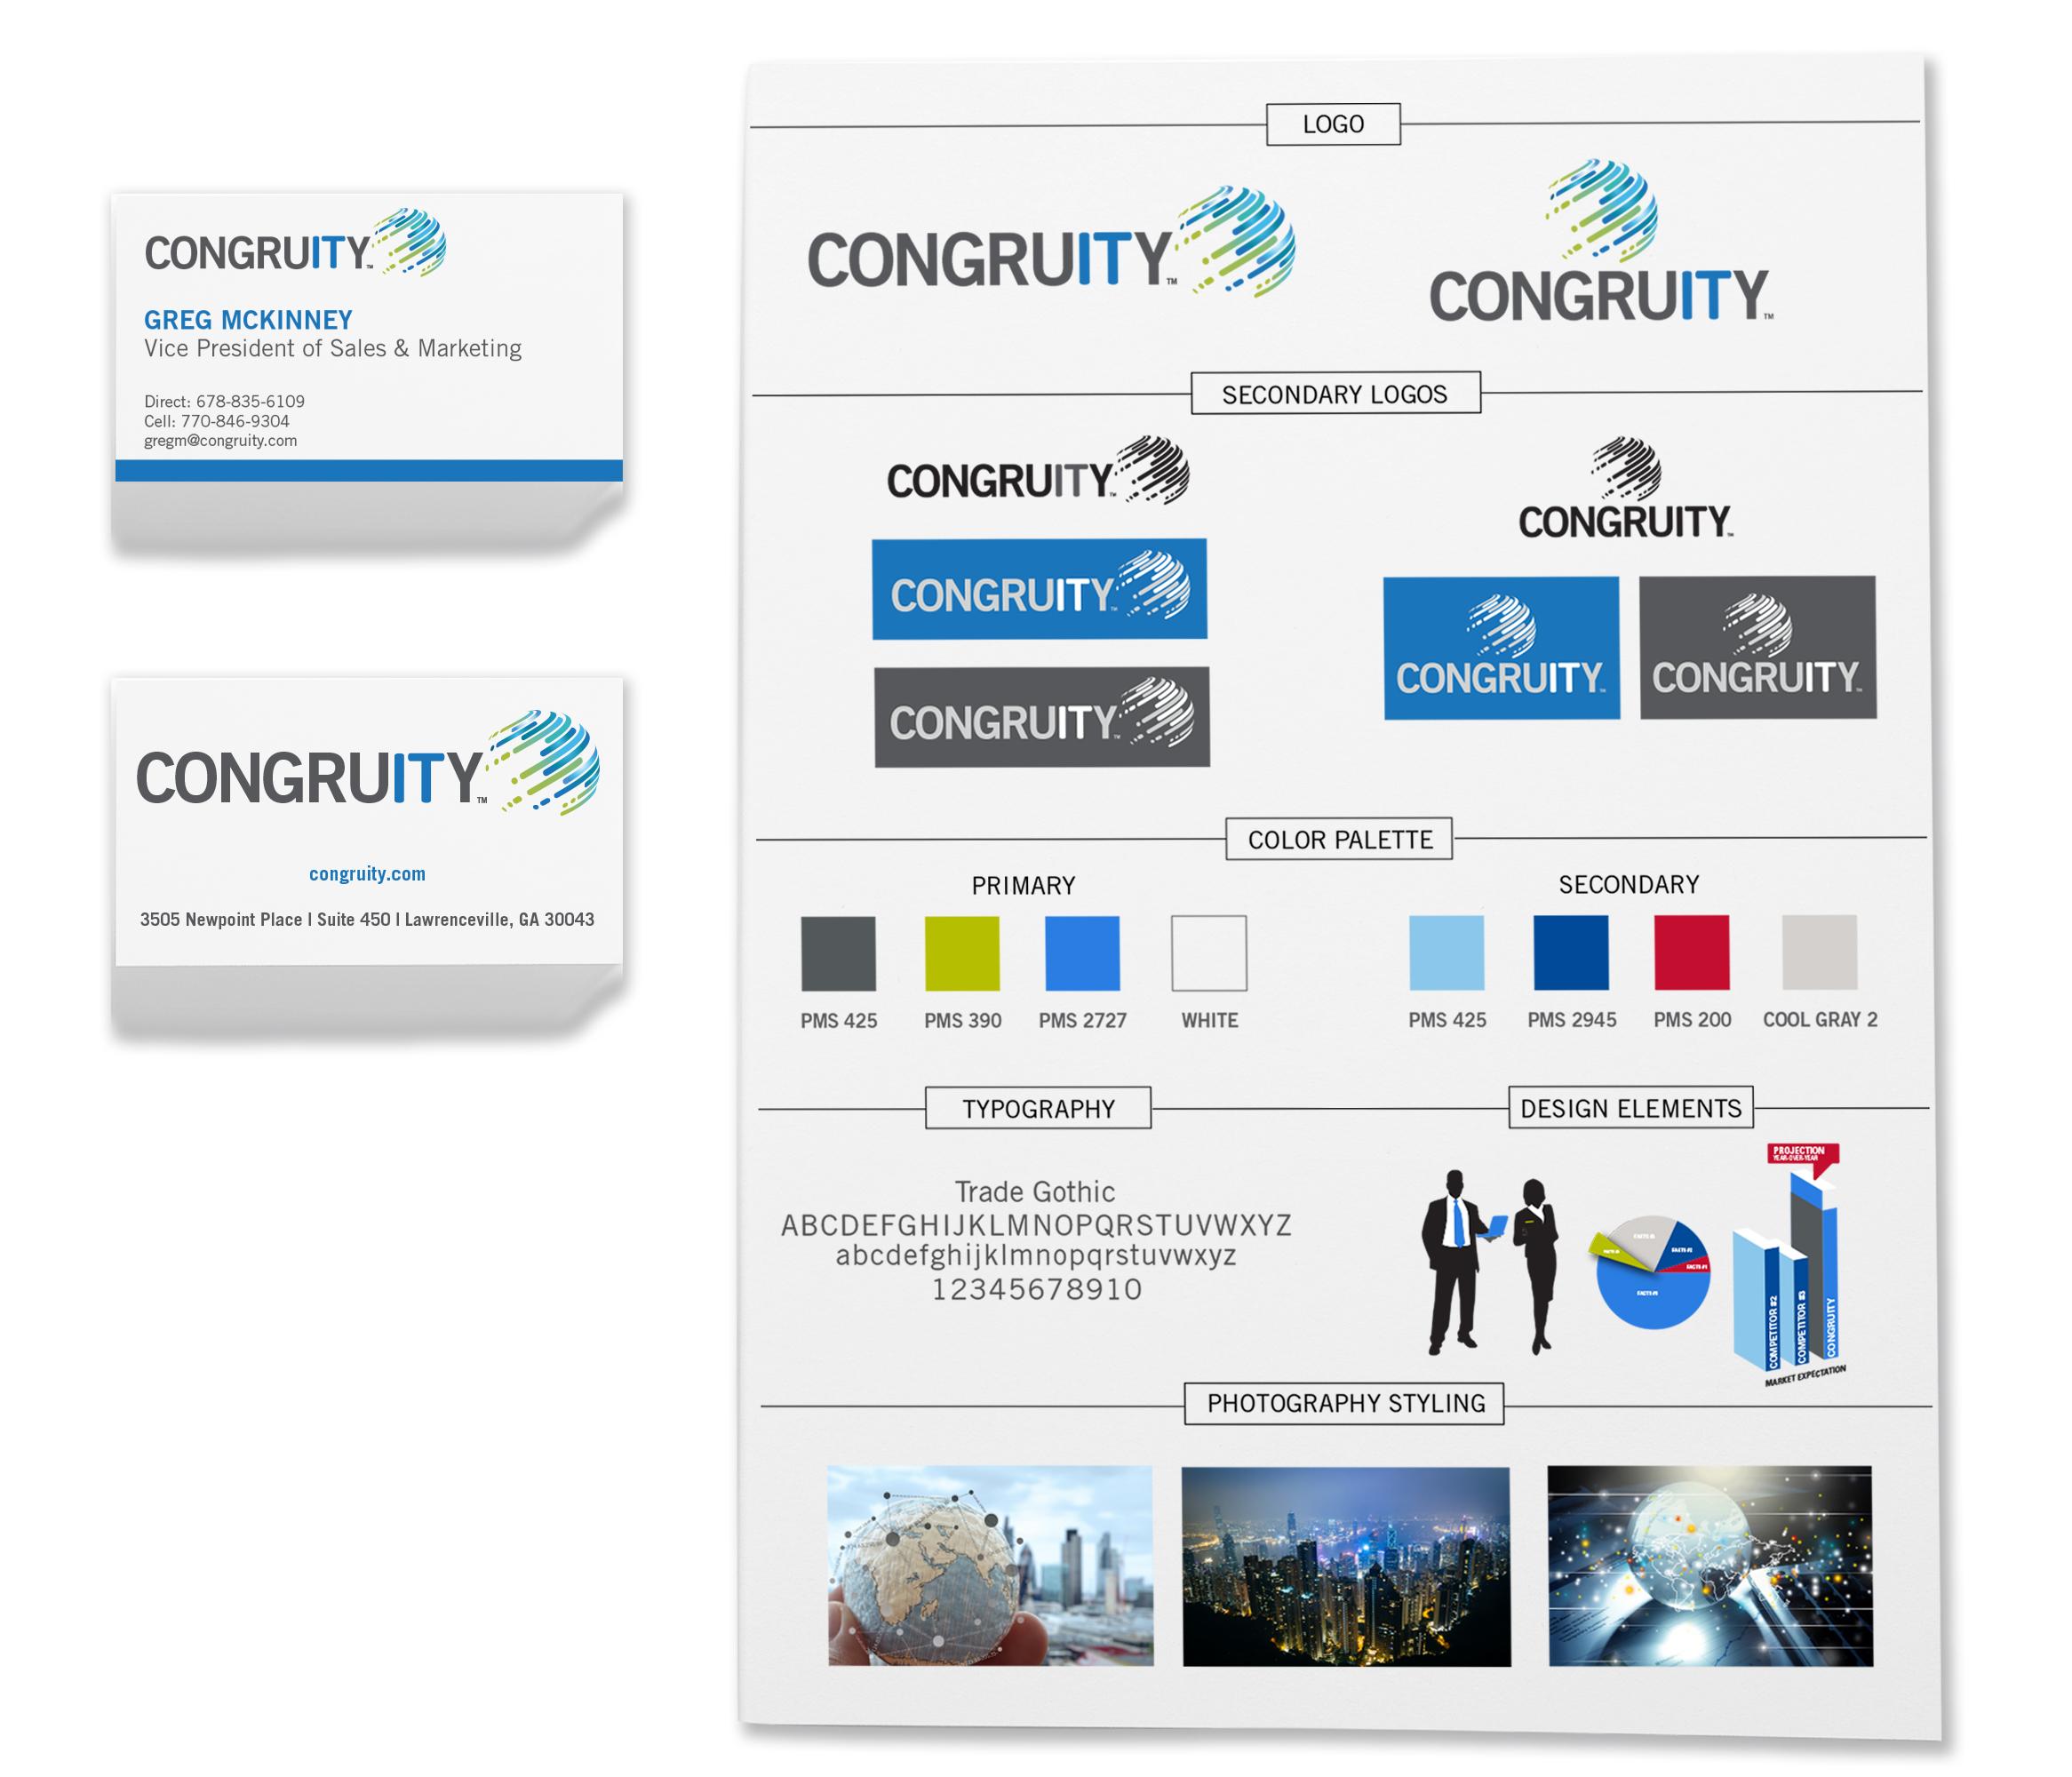 Congurity_Layout.jpg